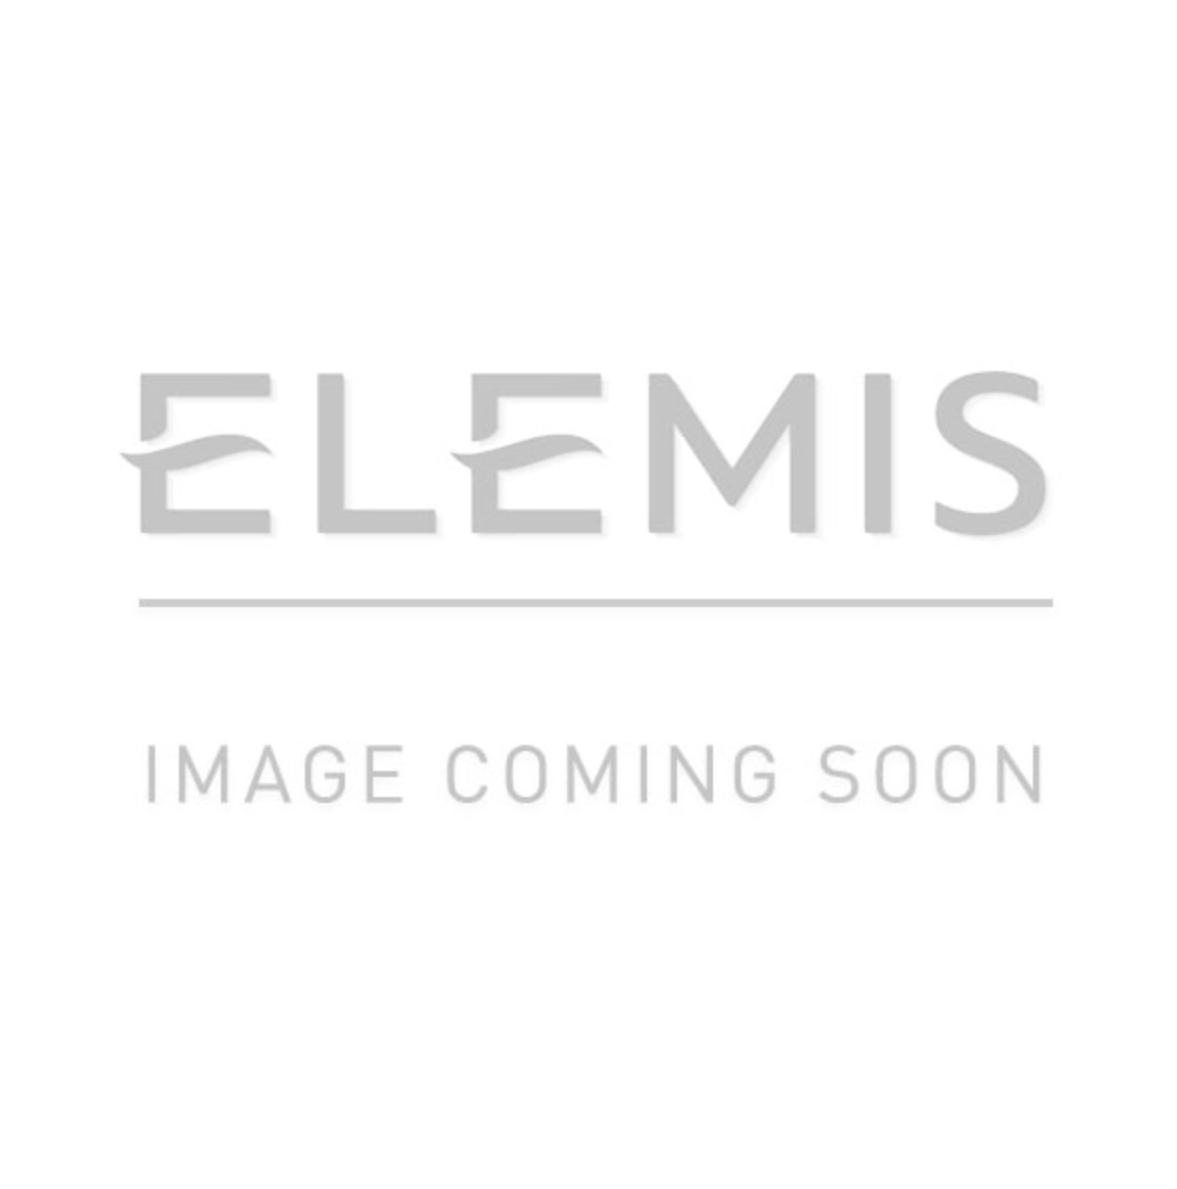 elemis cleansing balm